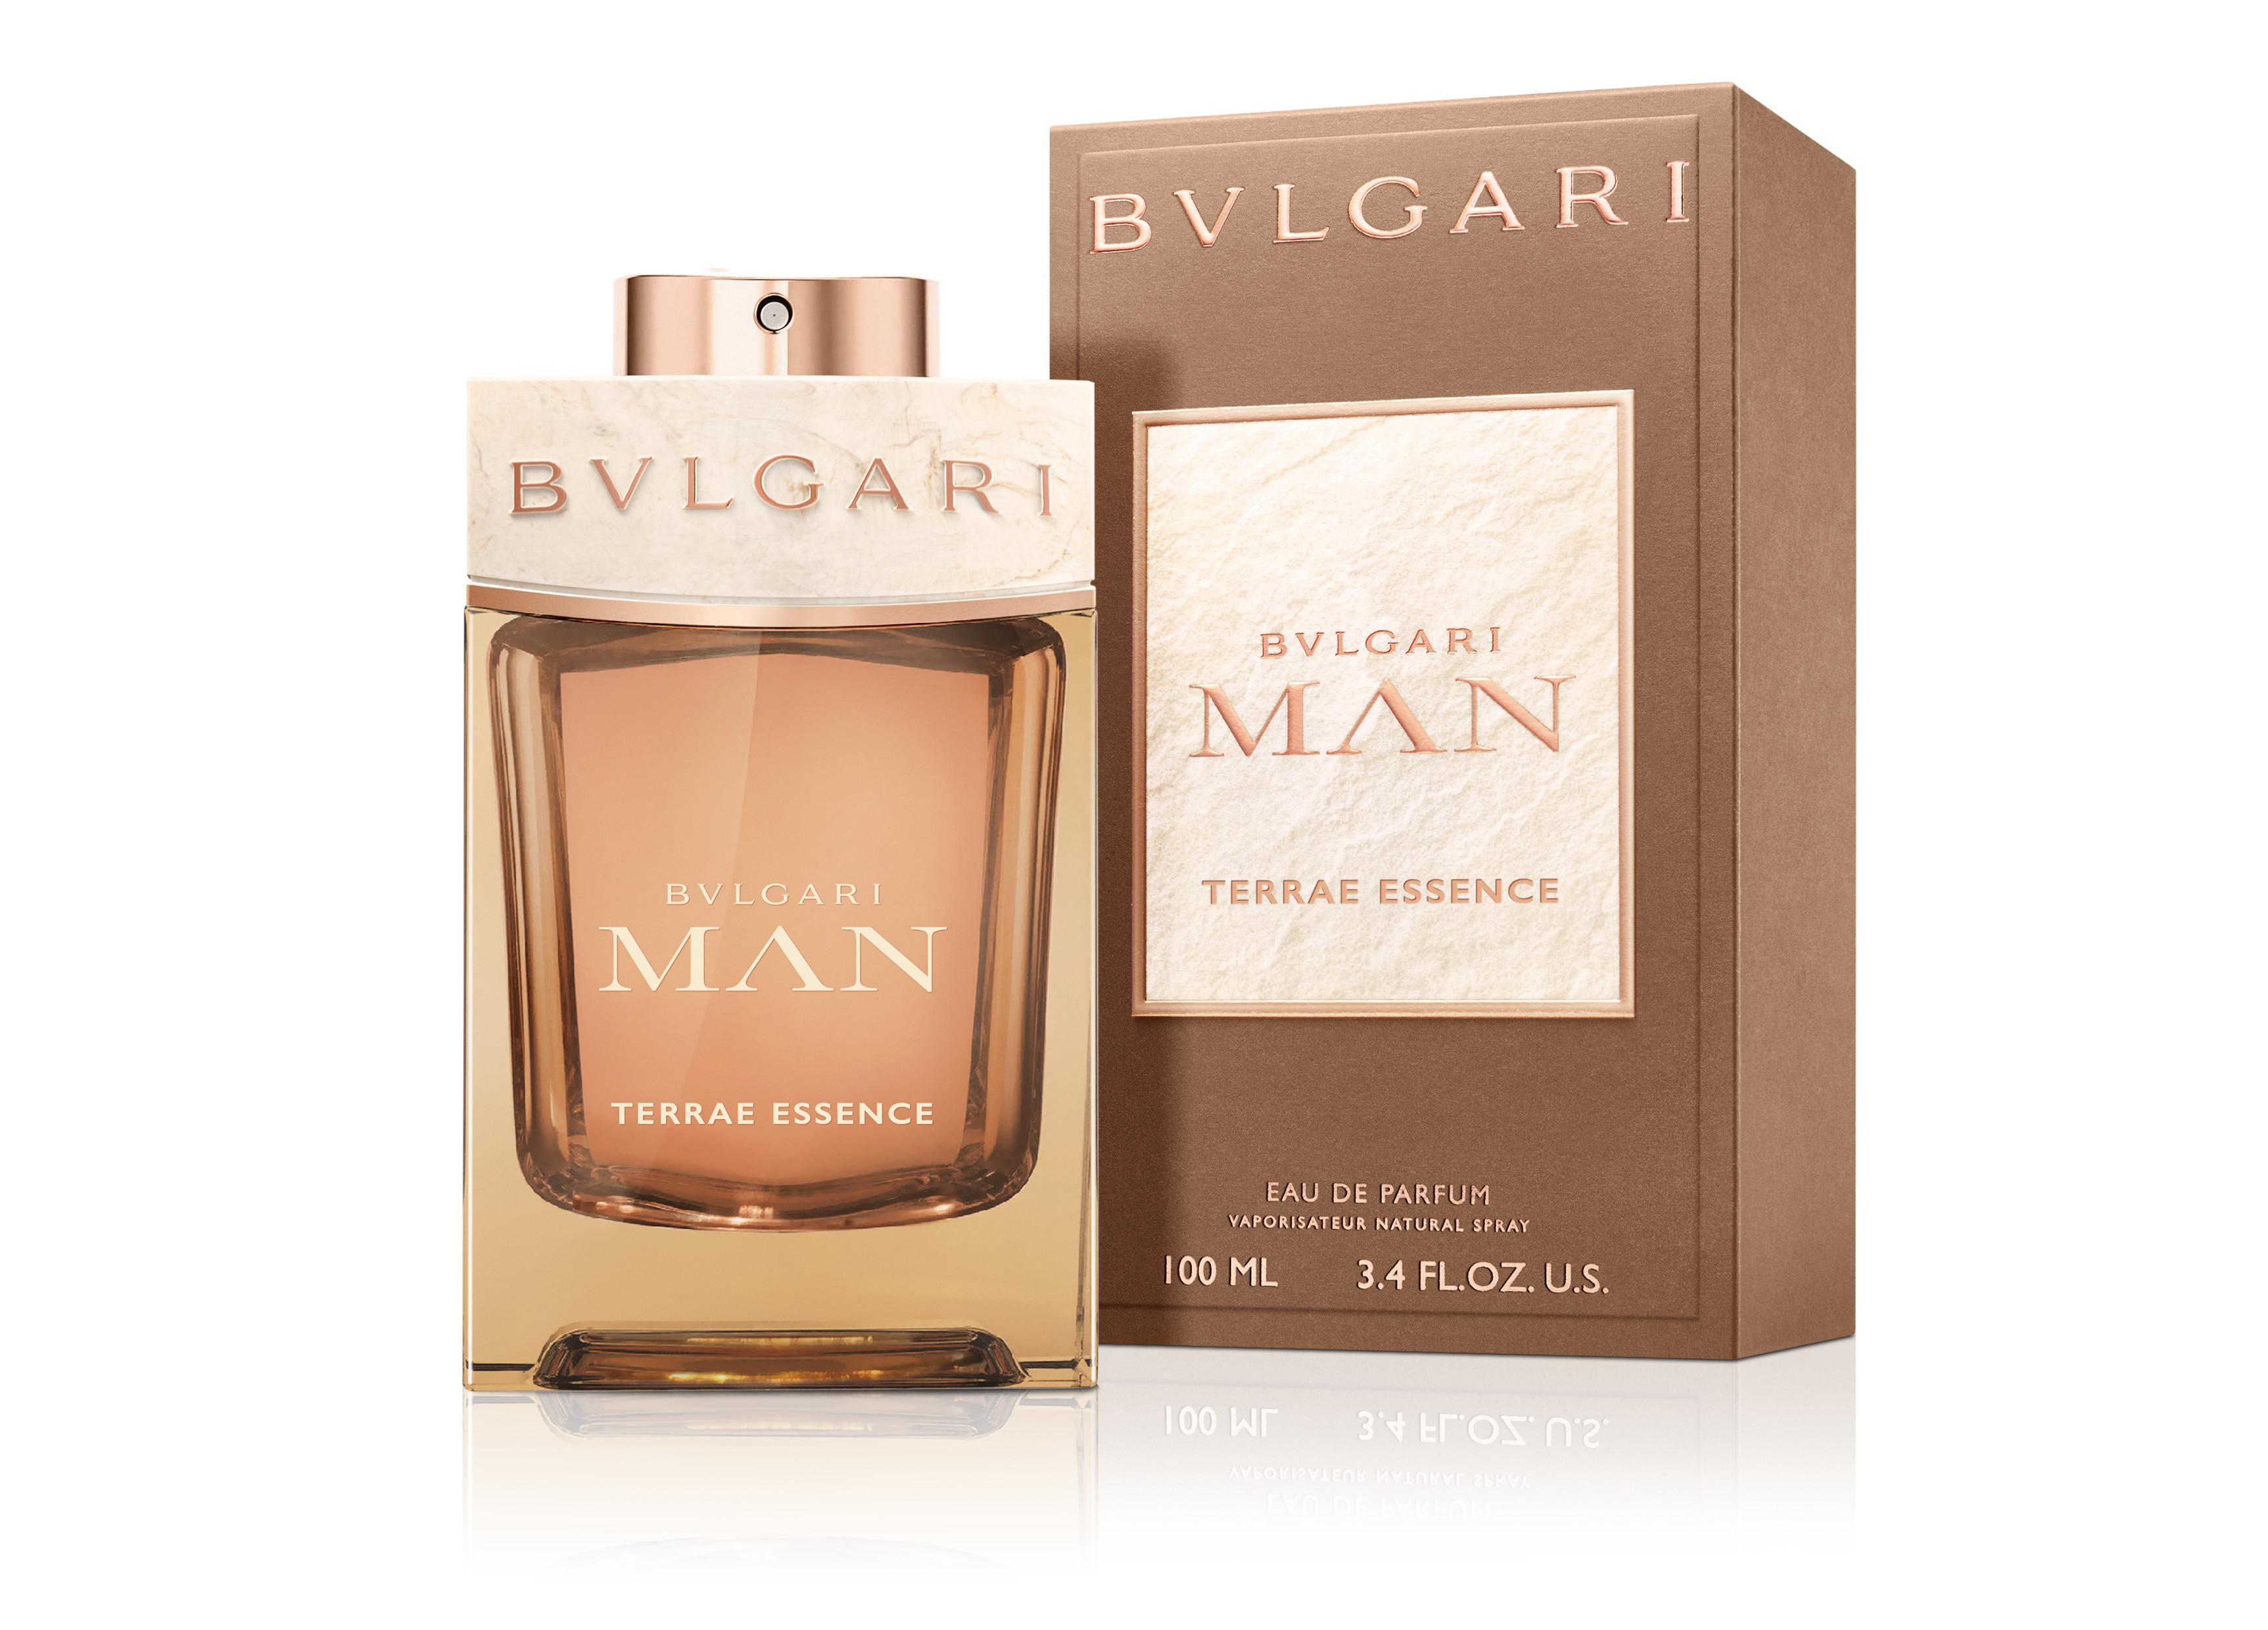 Bvlgari Man Terrae Essence Eau de Parfum, Trasparente, large image number 1